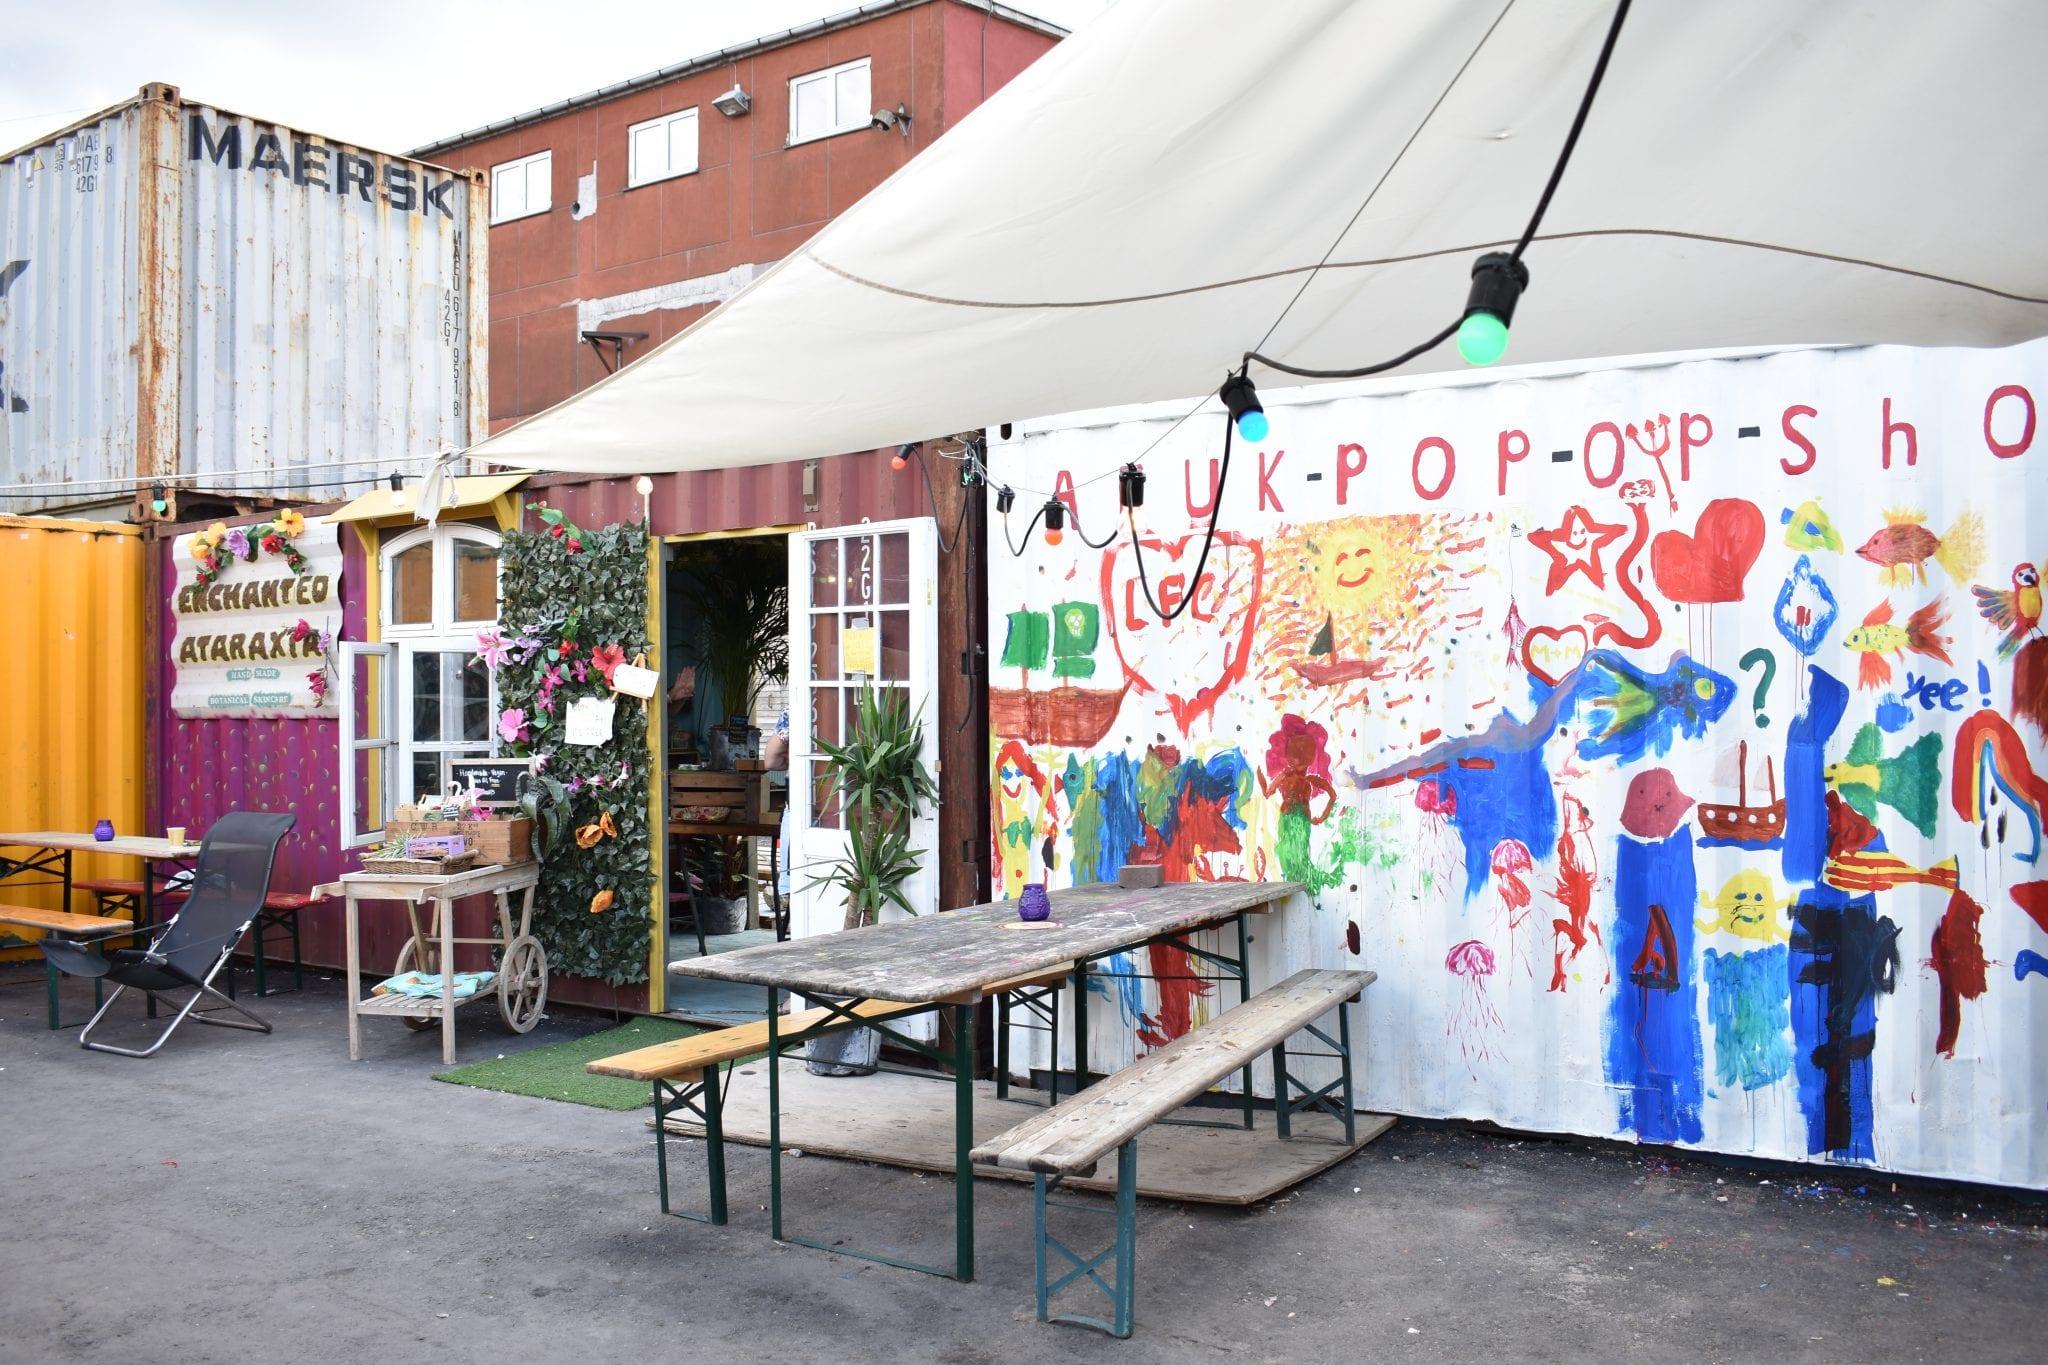 Copenaghen Tips - le plume